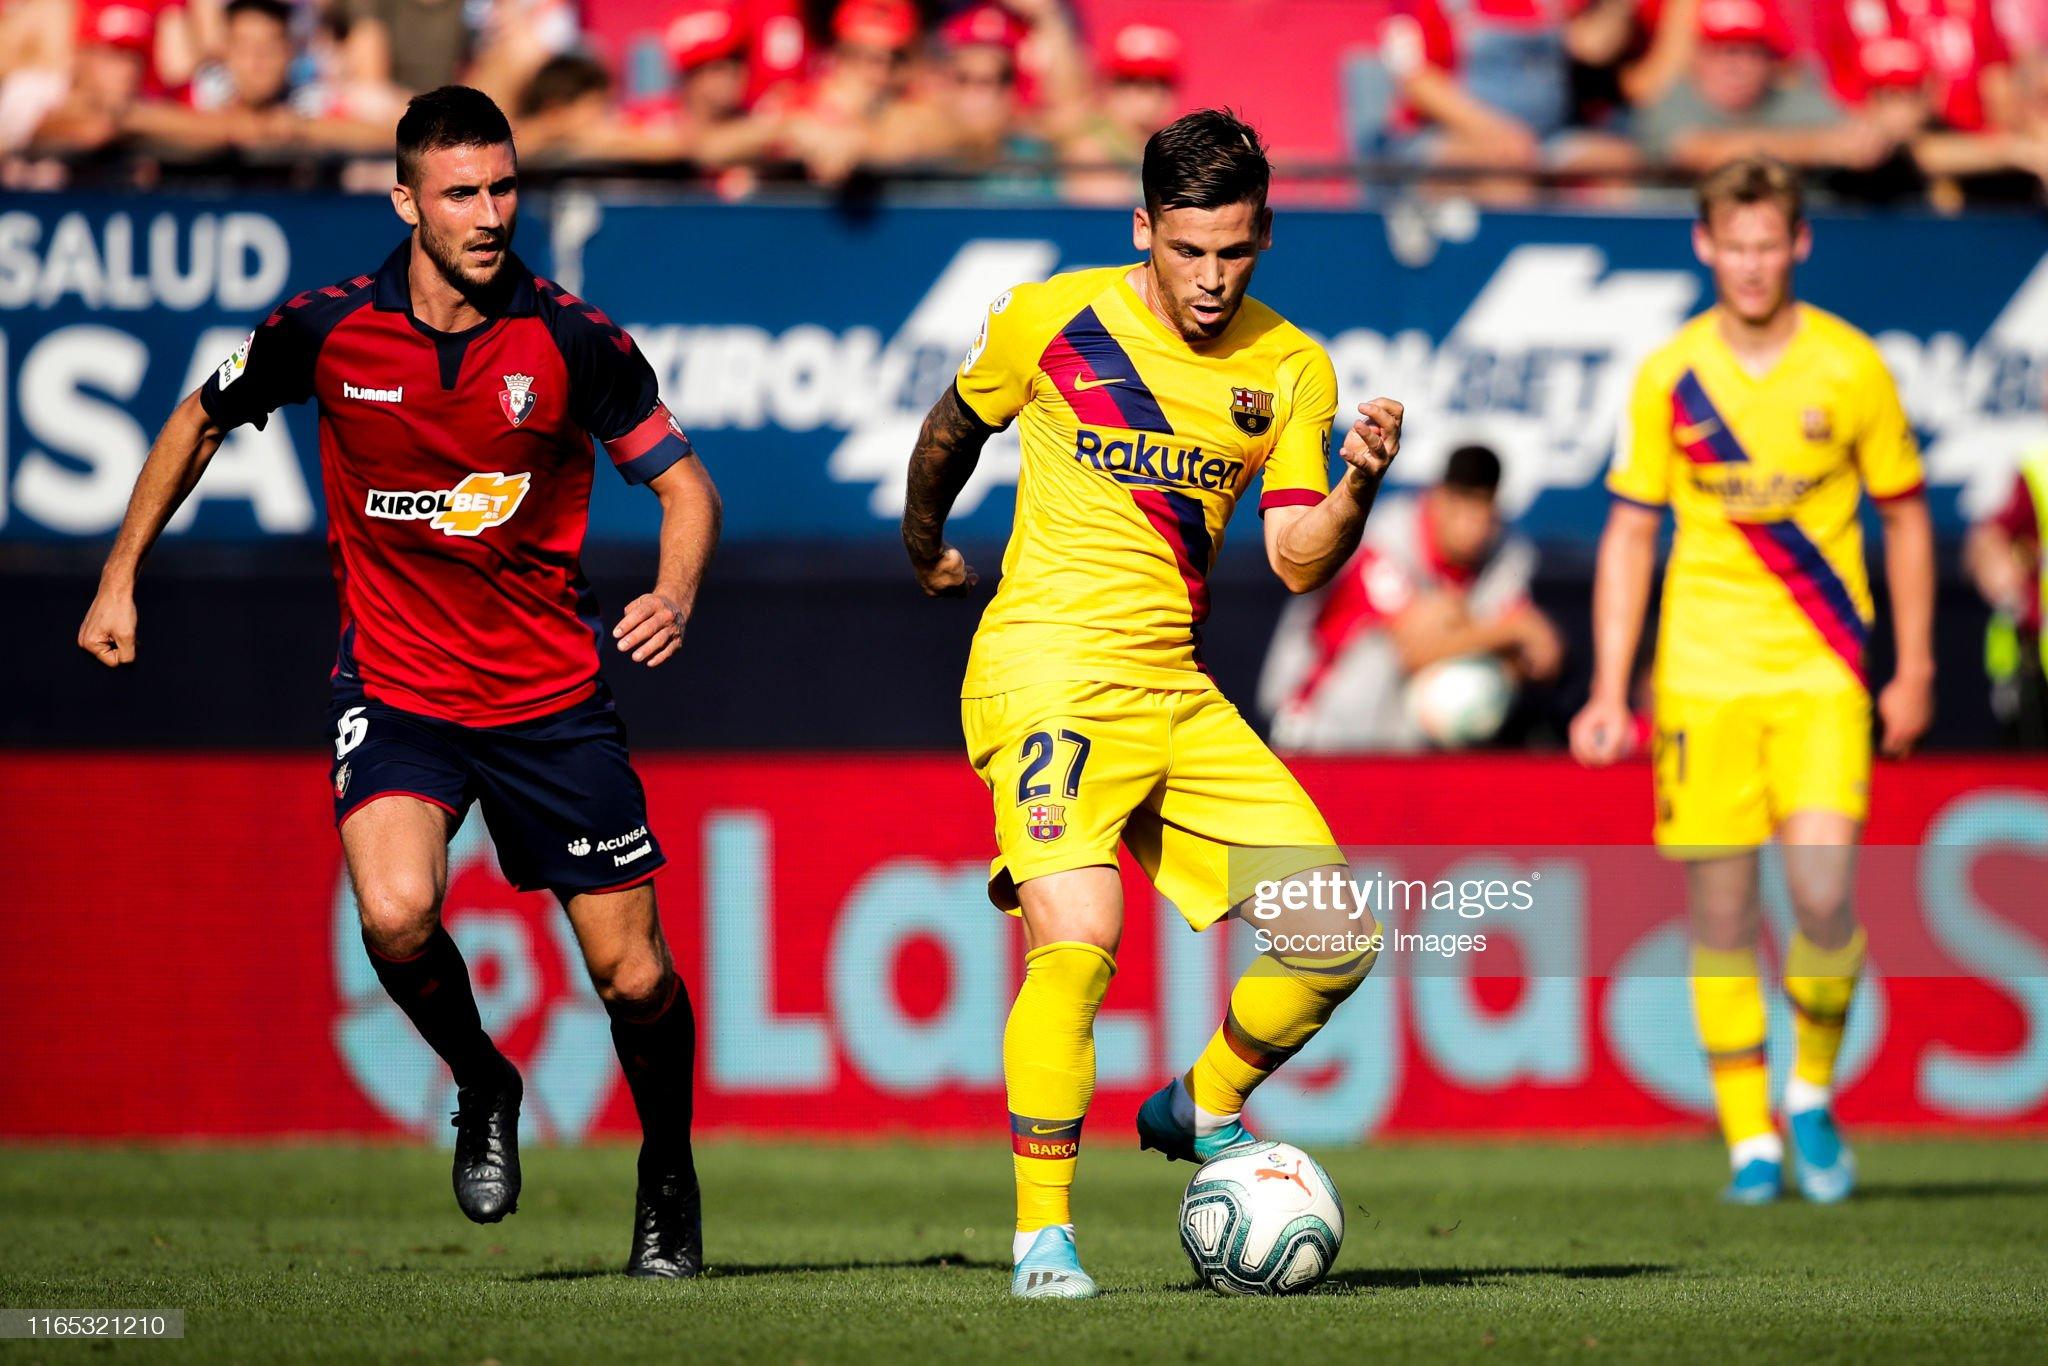 صور مباراة : أوساسونا - برشلونة 2-2 ( 31-08-2019 )  Carles-perez-of-fc-barcelona-during-the-la-liga-santander-match-v-picture-id1165321210?s=2048x2048